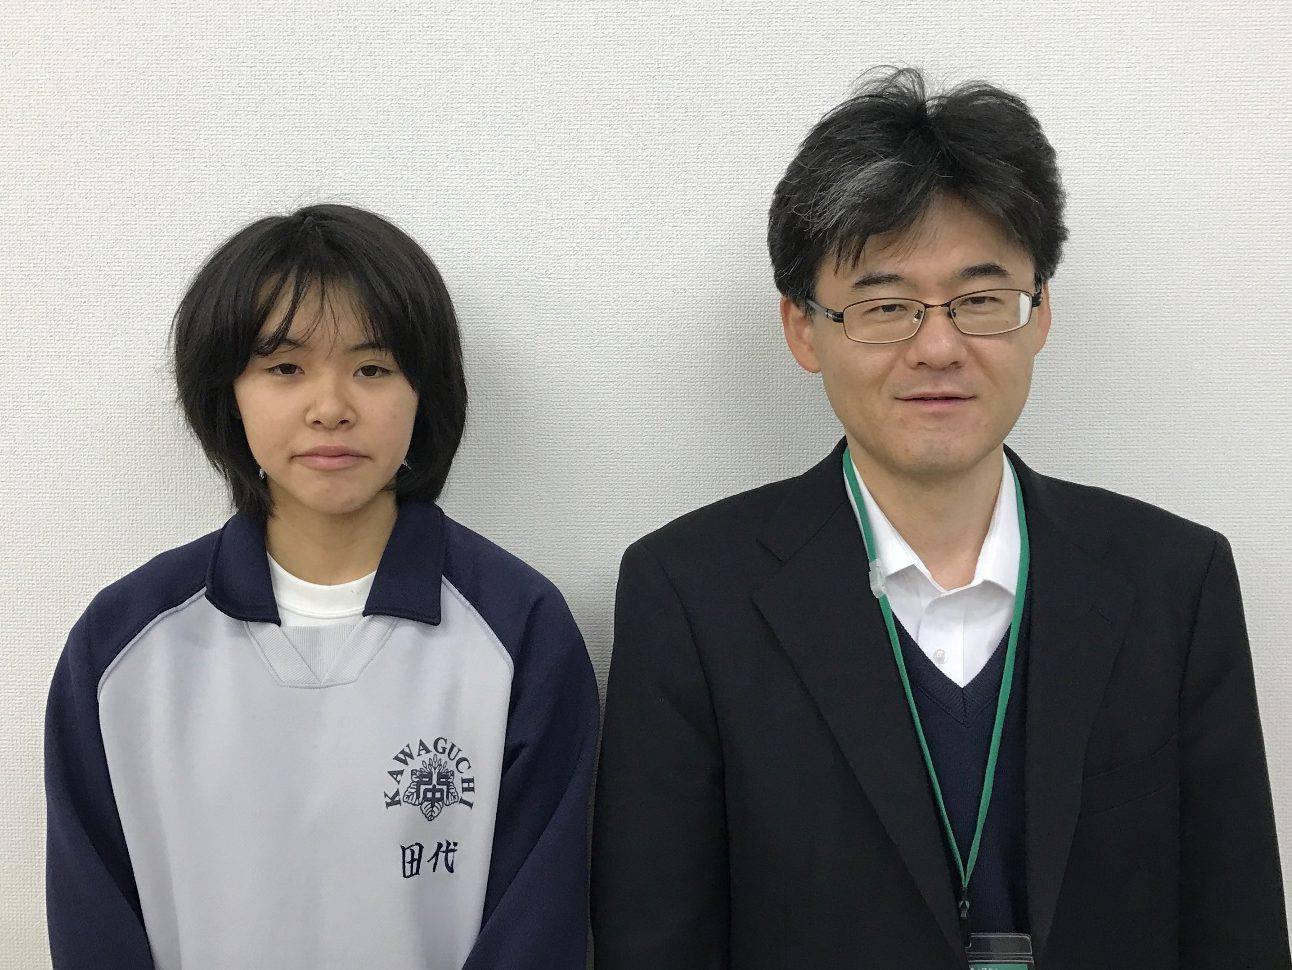 H29春 中学2年 田代詩織さん 吉野先生